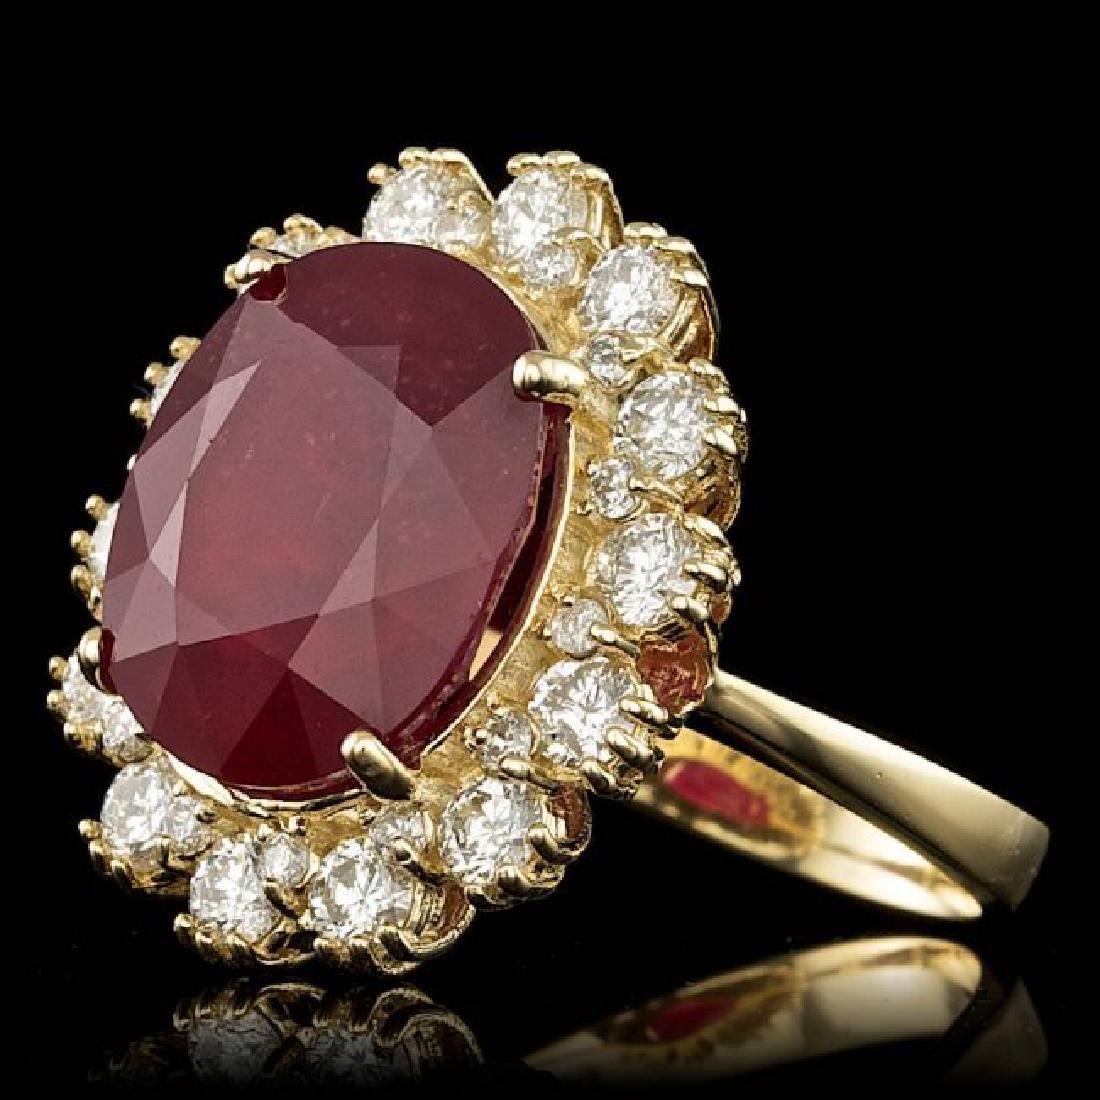 14k Yellow Gold 11.00ct Ruby 1.40ct Diamond Ring - 2